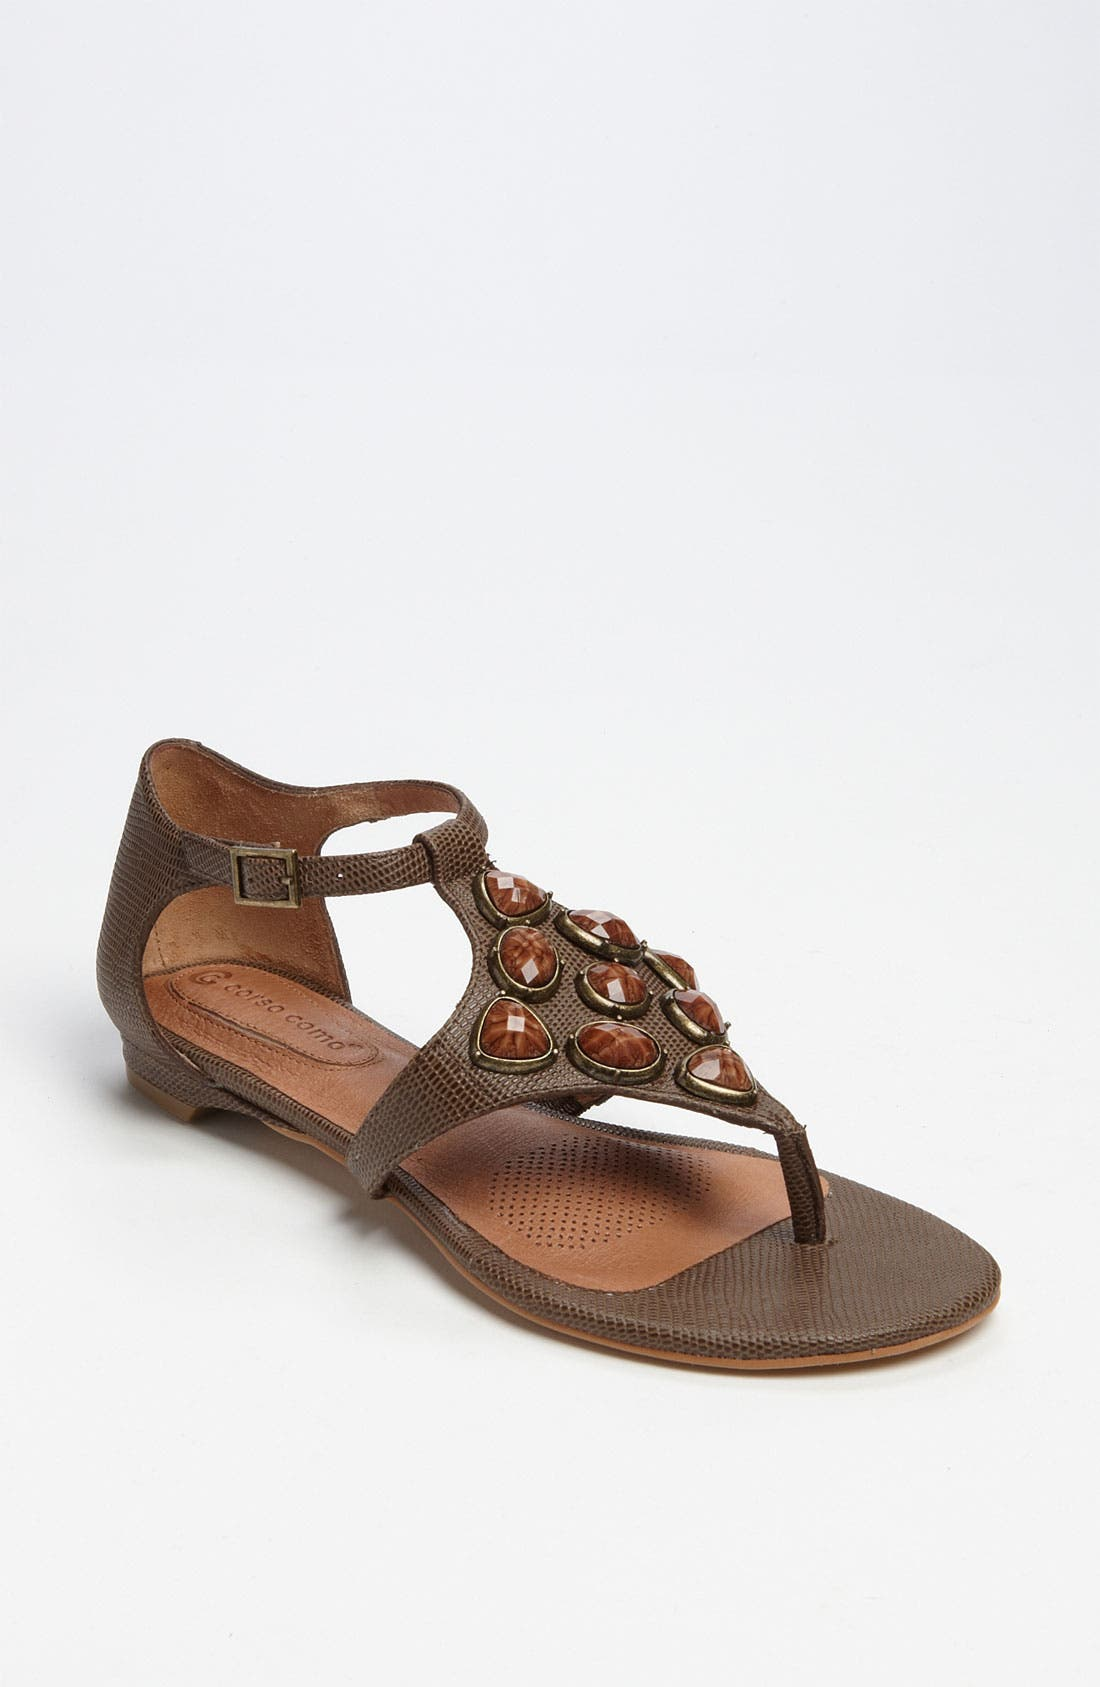 Main Image - Corso Como 'Folic' Sandal